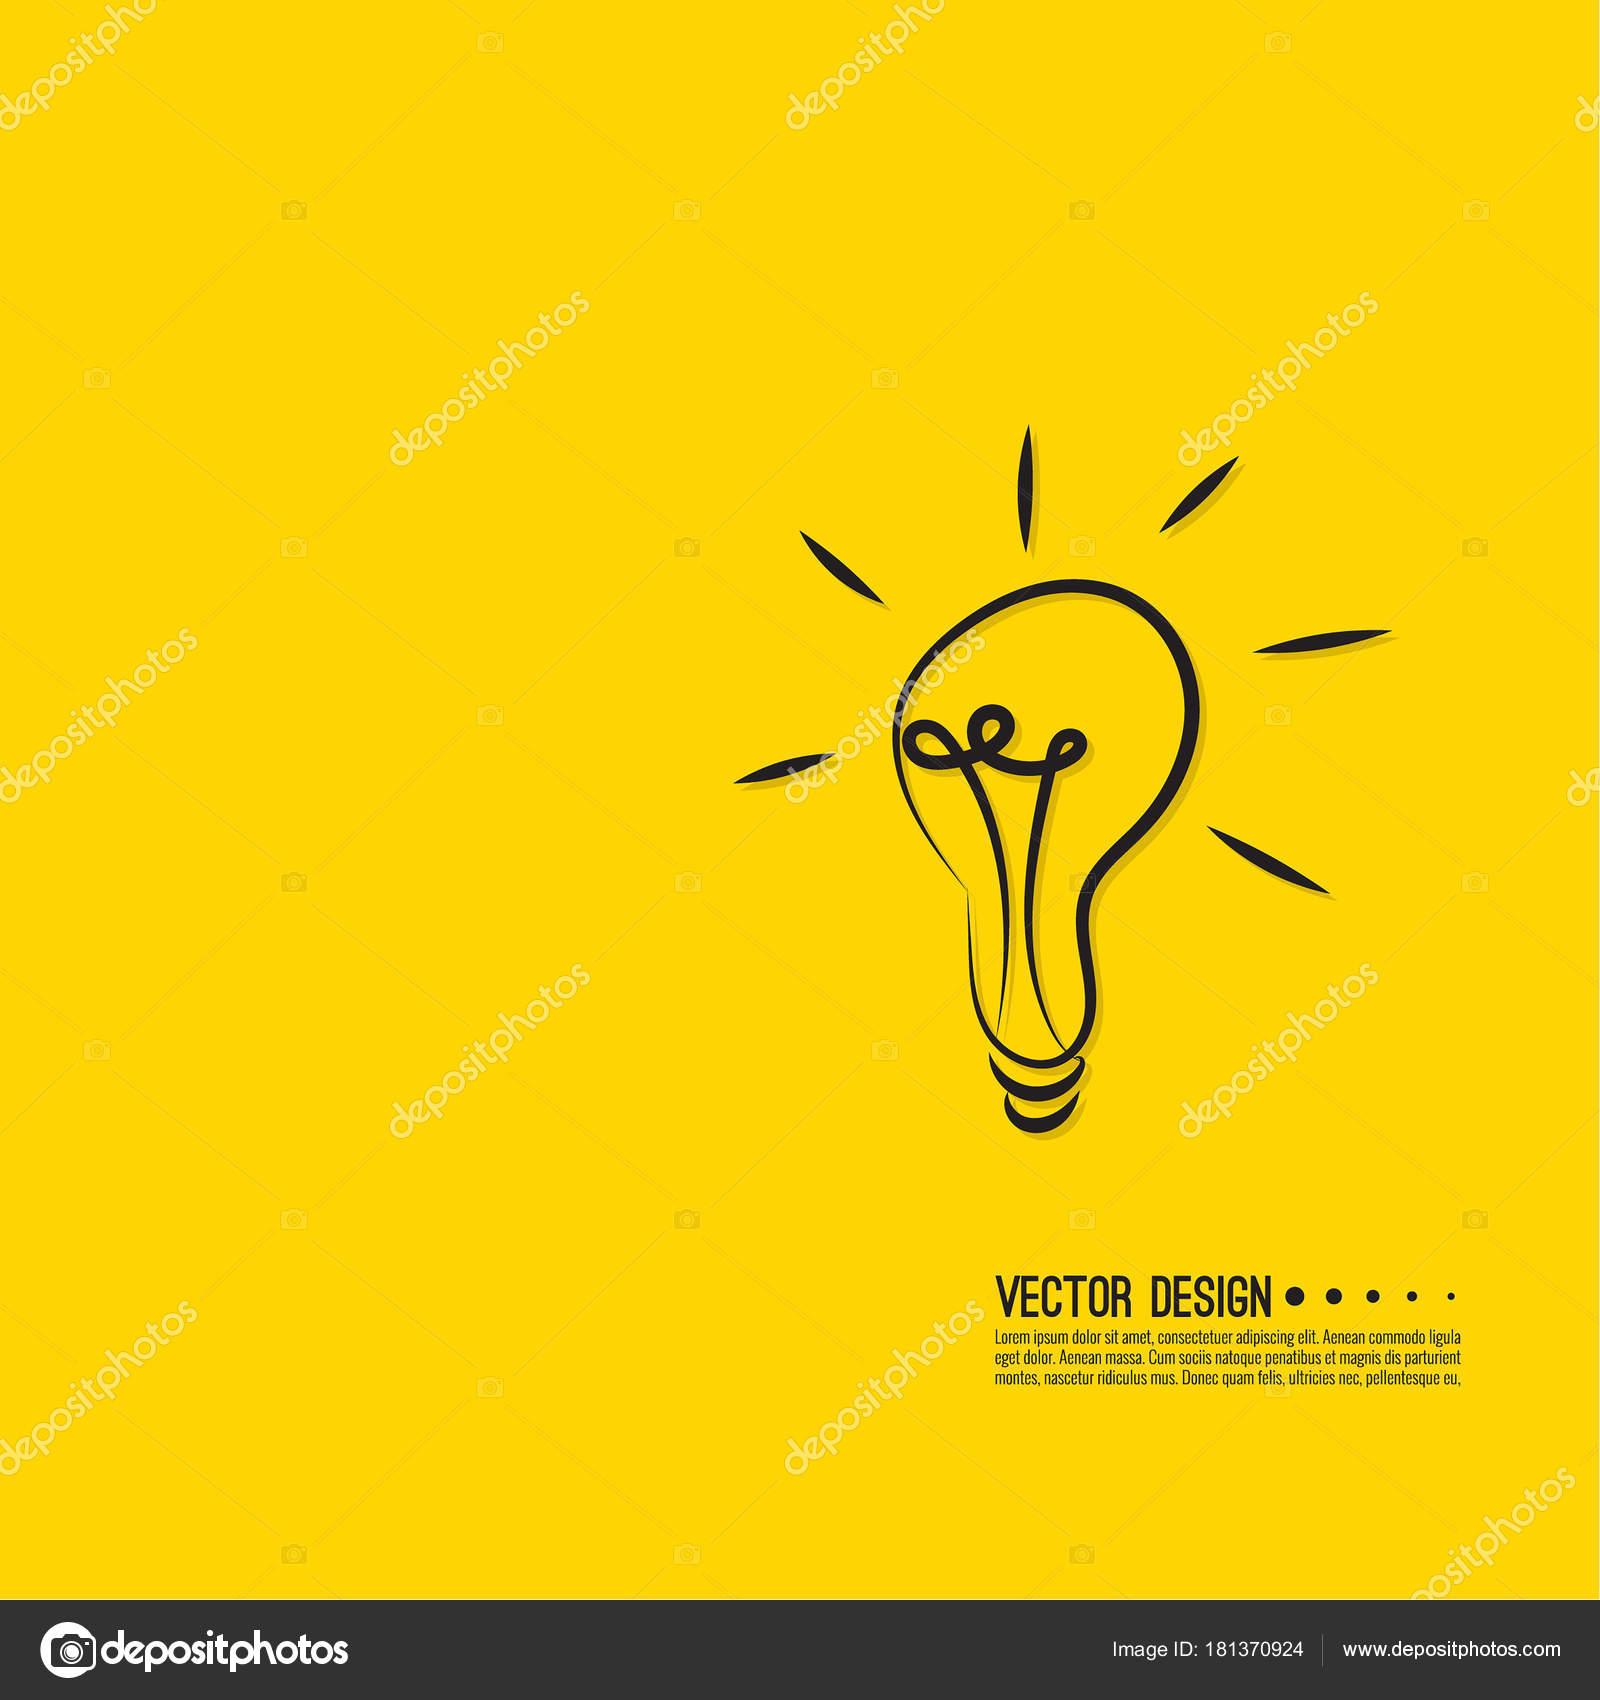 Fabulous Good Lamp Licht Idee Stockvector Sumkinn With Badkamer Bouwen Hul  With Licht Idee